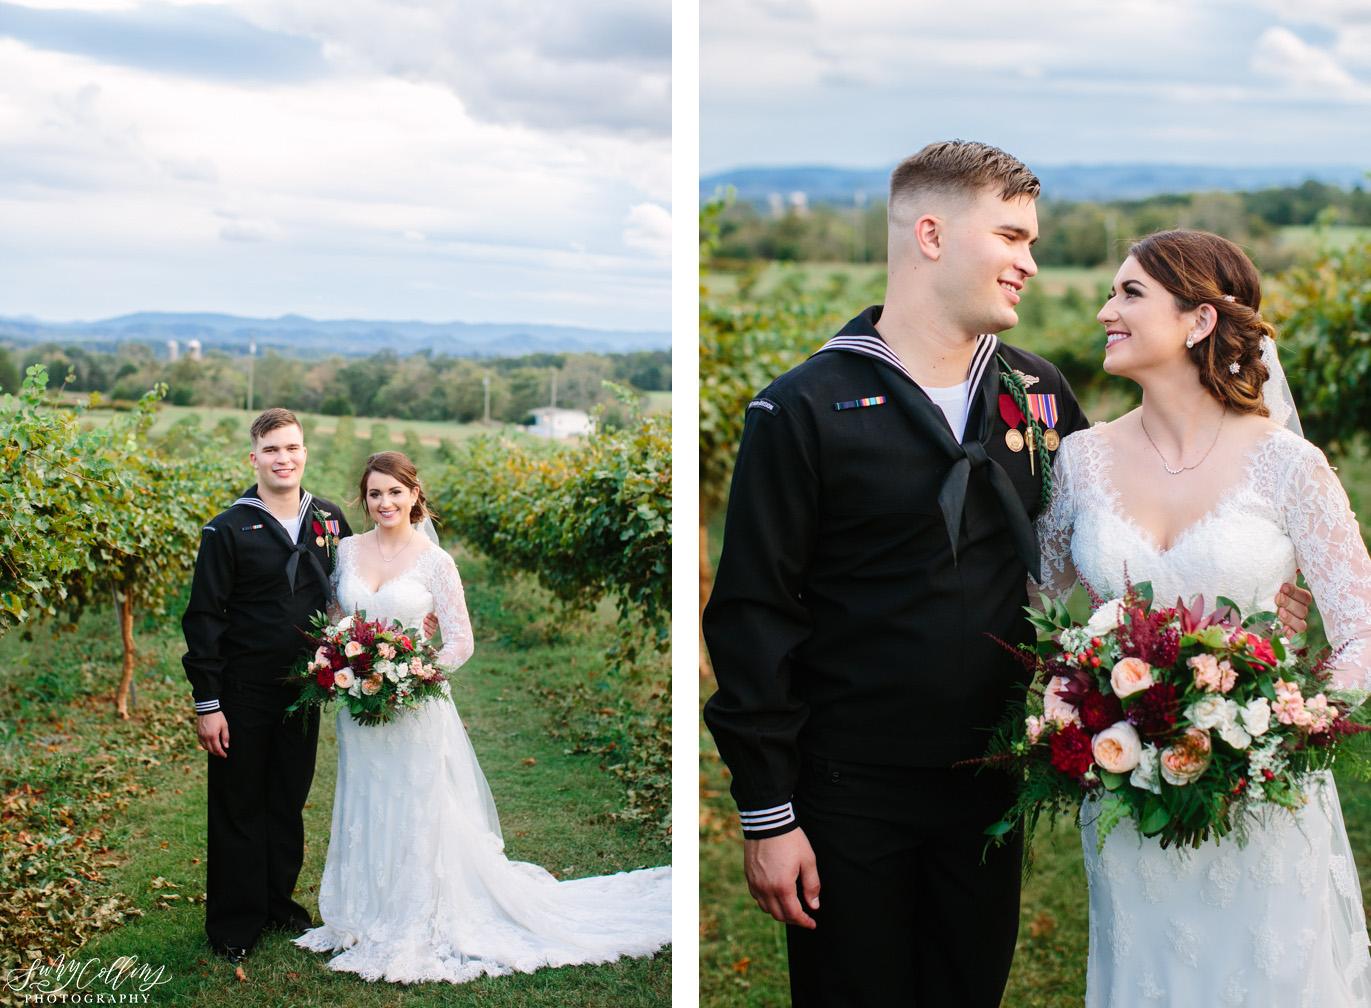 Fall Vineyard Mountain Wedding Portraits